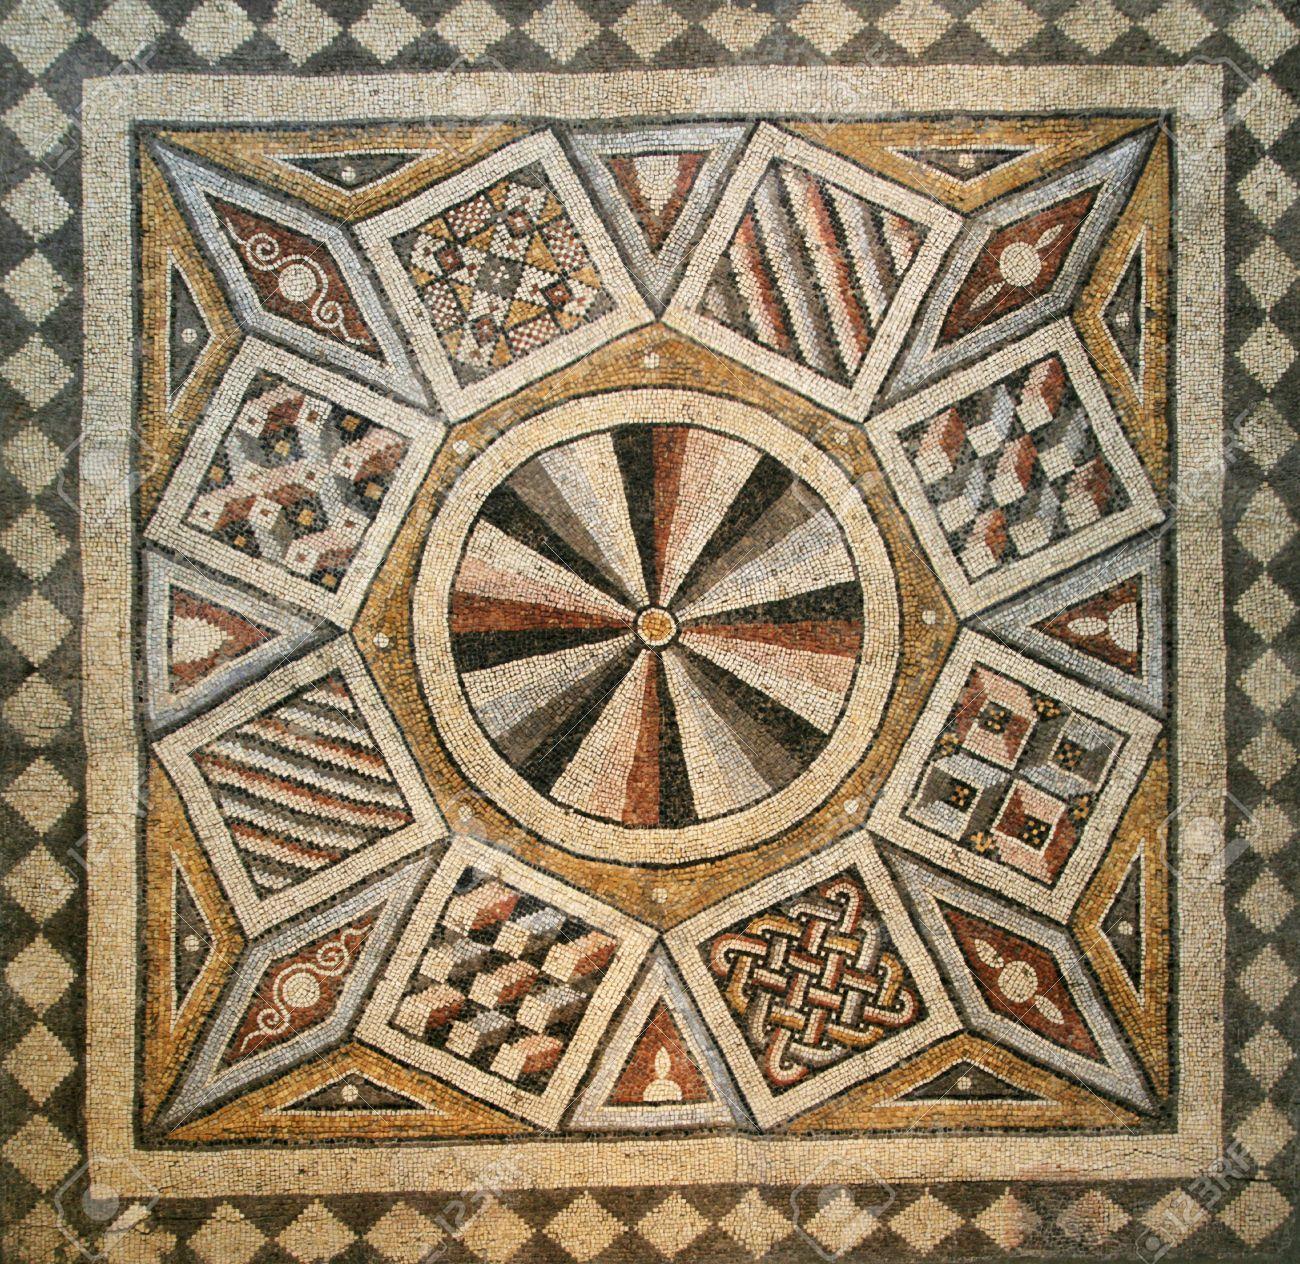 Ancient tiles roman mosaic tile floor with geometric pattern ancient tiles roman mosaic tile floor with geometric pattern dailygadgetfo Image collections